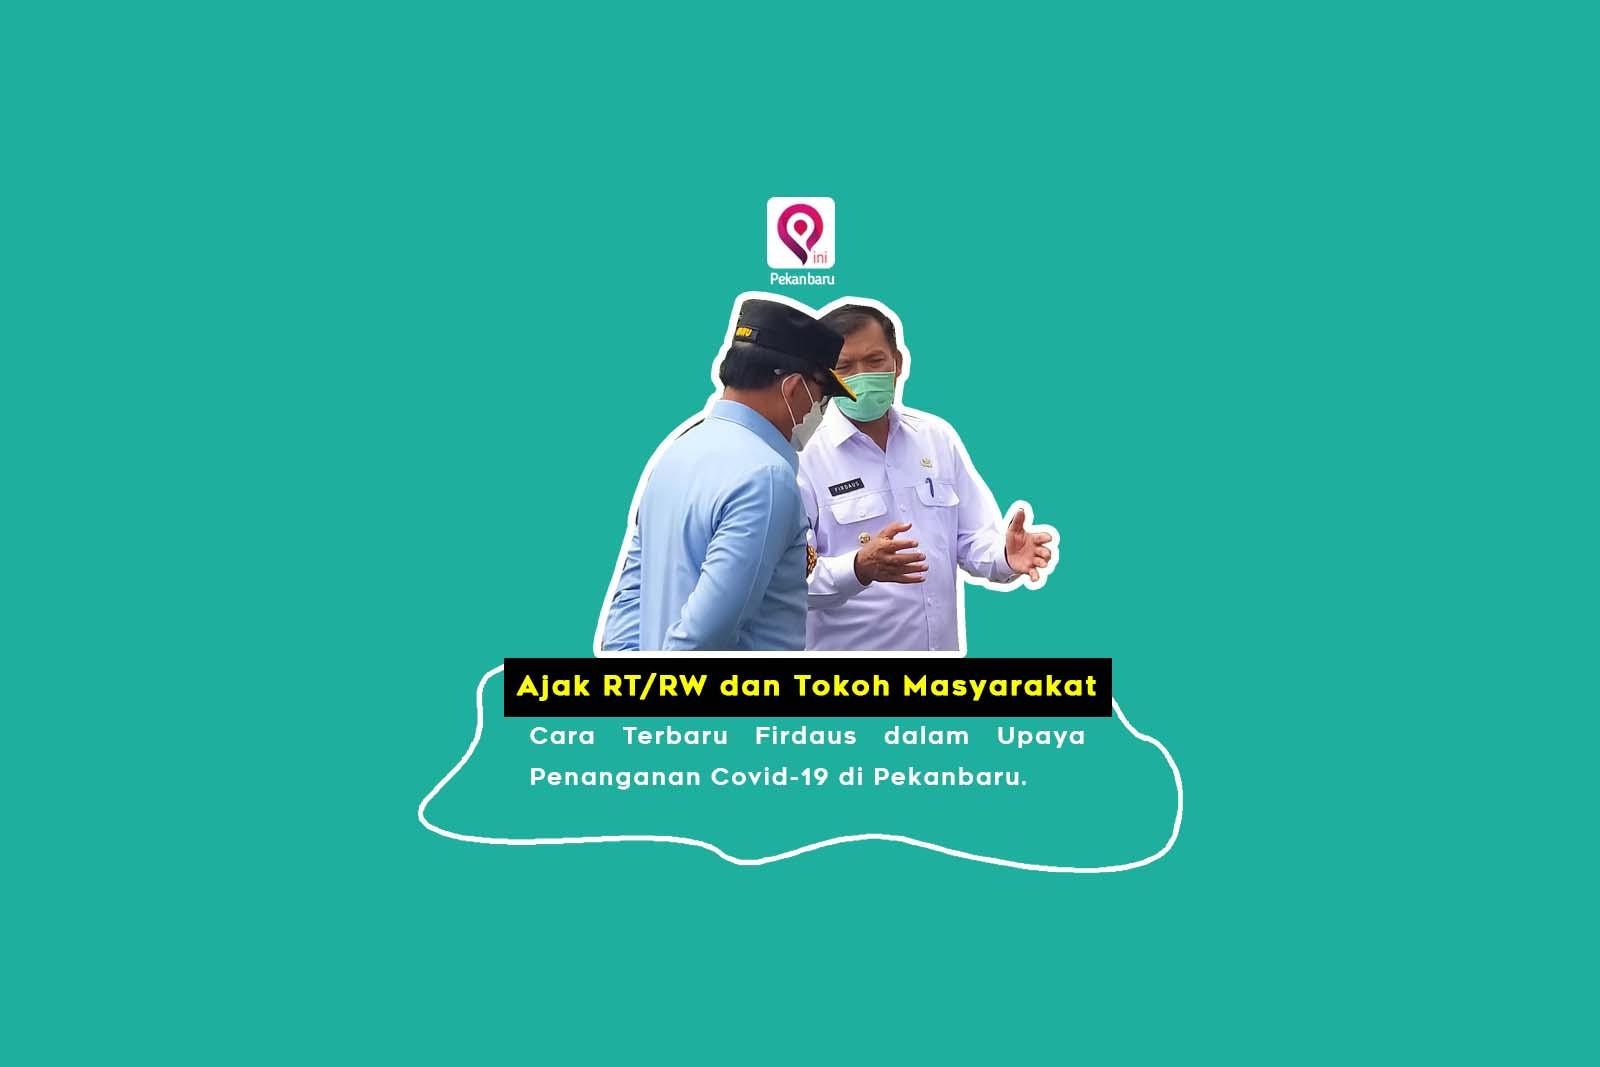 Ajak RT/RW dan Tokoh Masyarakat, Cara Terbaru Firdaus dalam Upaya Penanganan Covid-19 di Pekanbaru